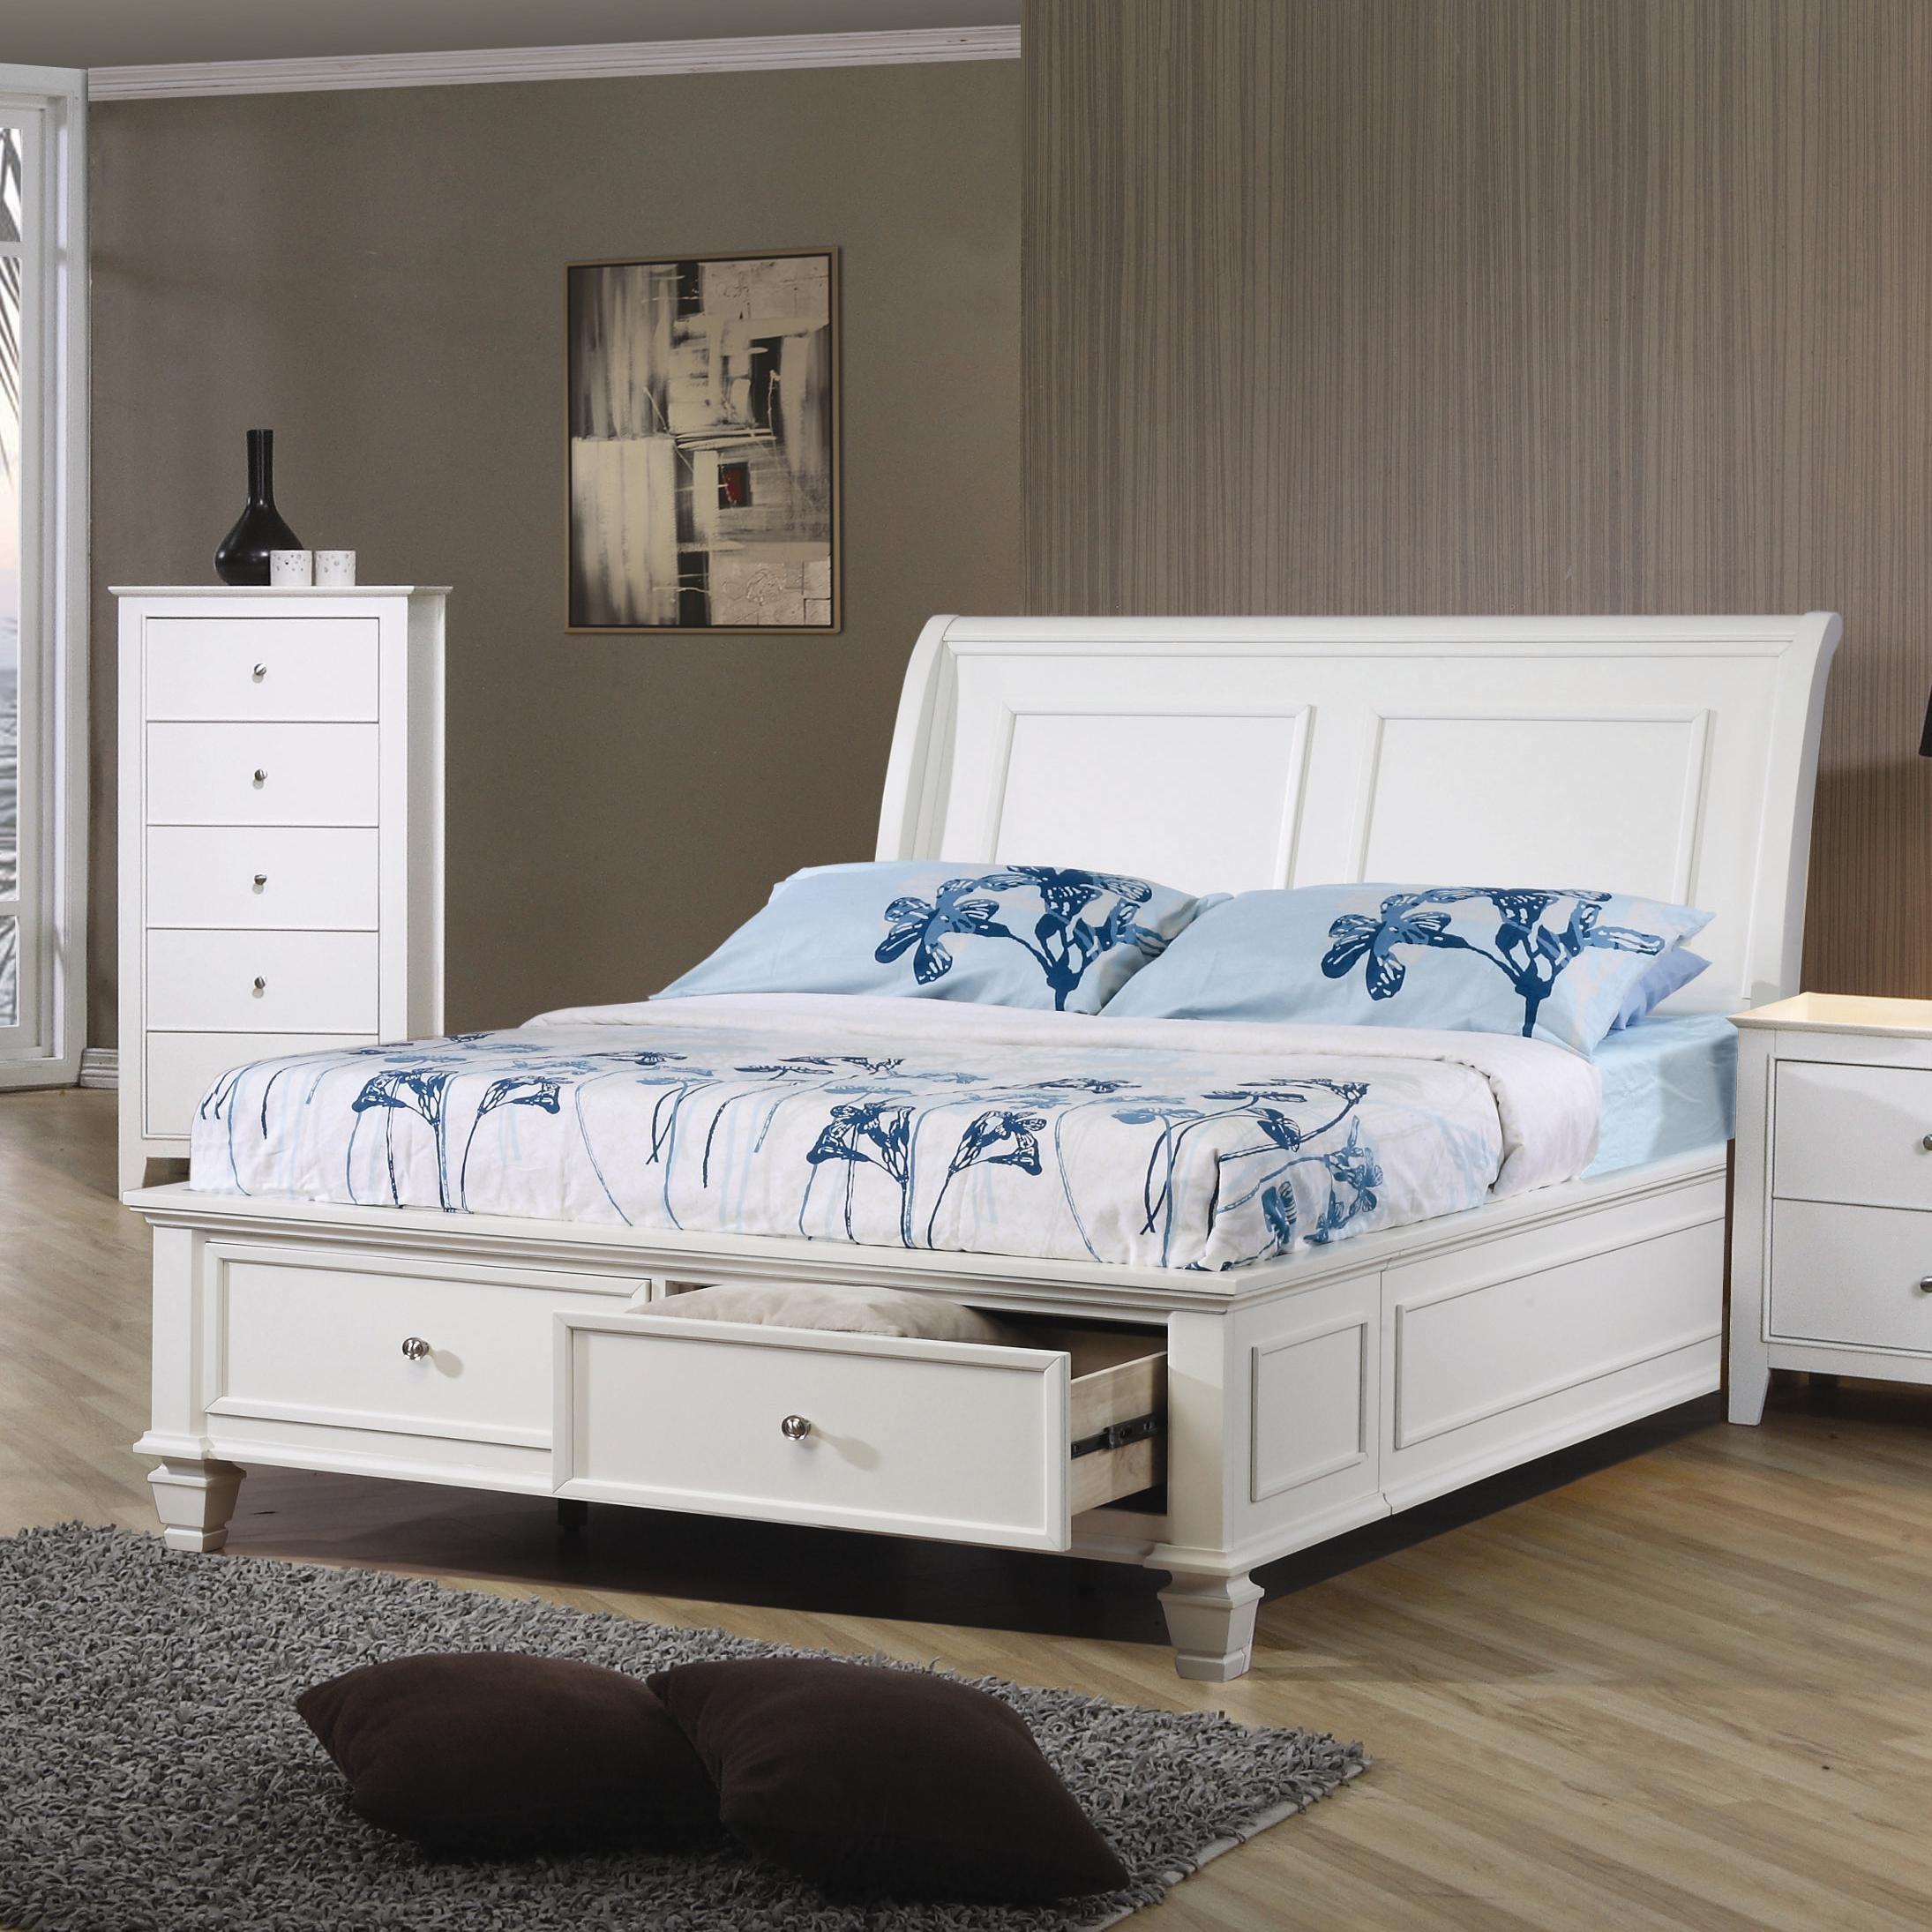 Coaster Bedroom Full Bed F Aaron s Fine Furniture Altamonte Spr